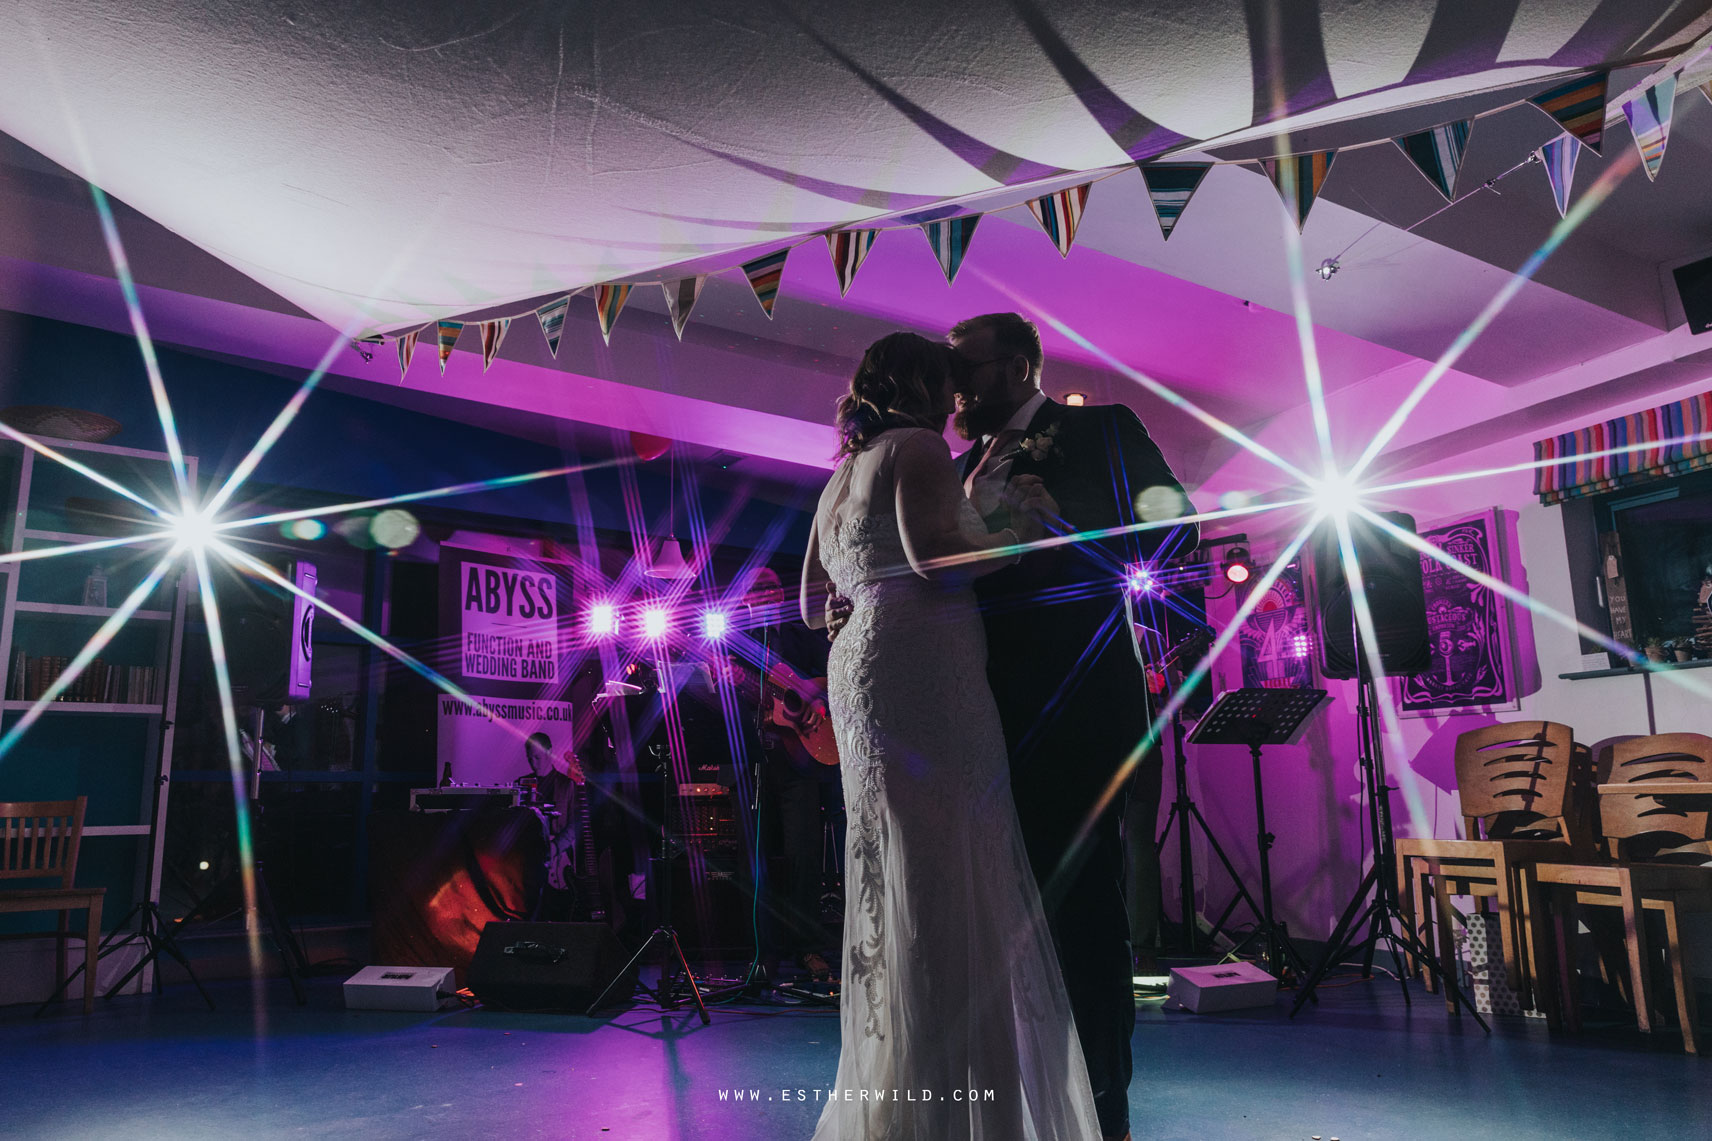 Cromer_Wedding_Beach_Outdoor_Ceremony_Norfolk_North_Lodge_Registry_Office_Rocket_House_Cafe_Cromer_Pier_IMG_5483.jpg